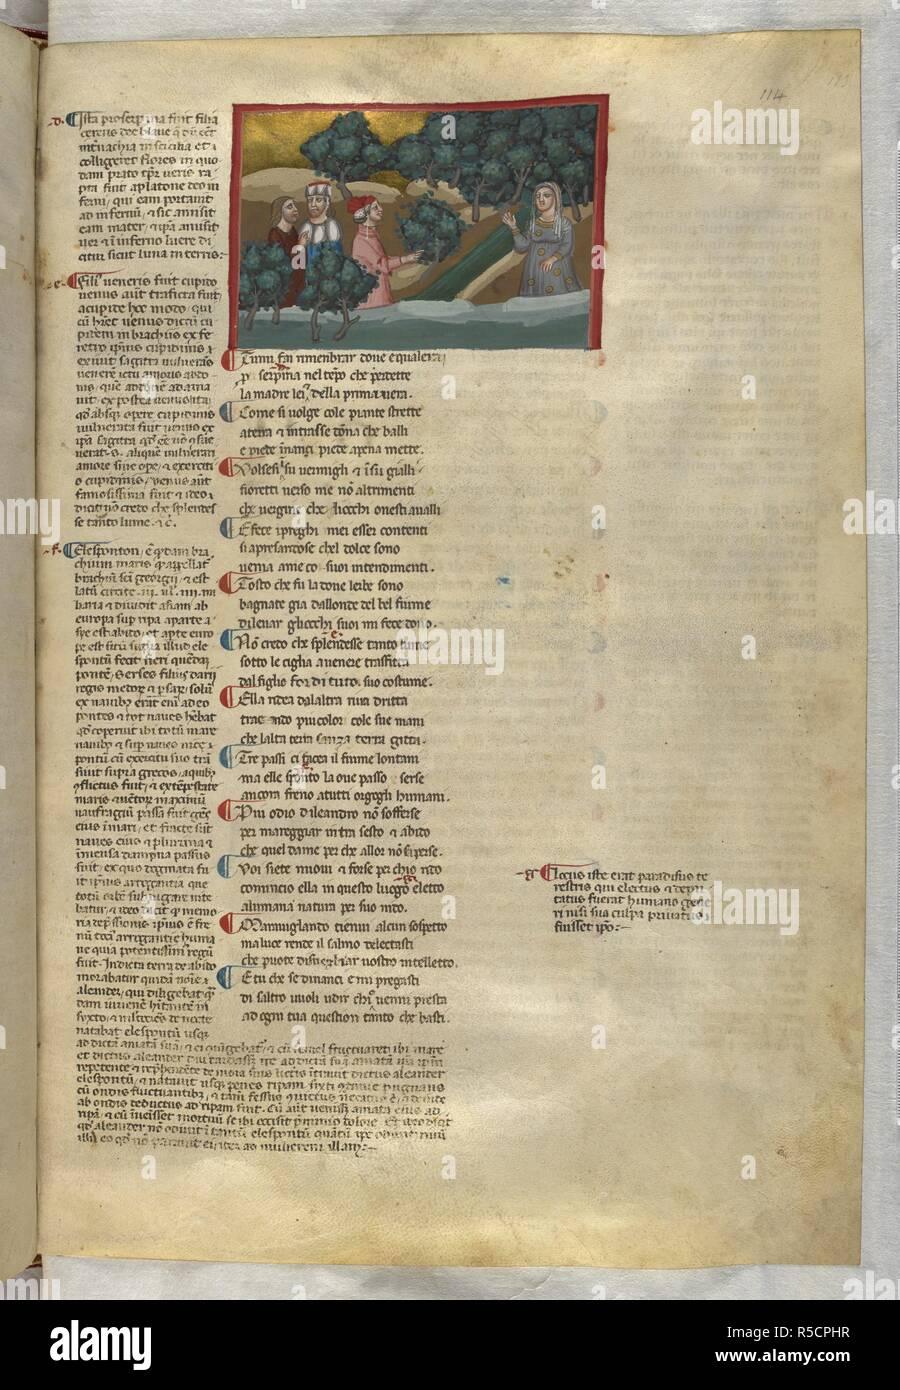 Purgatorio:  They meet Matilda. Dante Alighieri, Divina Commedia ( The Divine Comedy ), with a commentary in Latin. 1st half of the 14th century. Source: Egerton 943, f.114. Language: Italian, Latin. - Stock Image